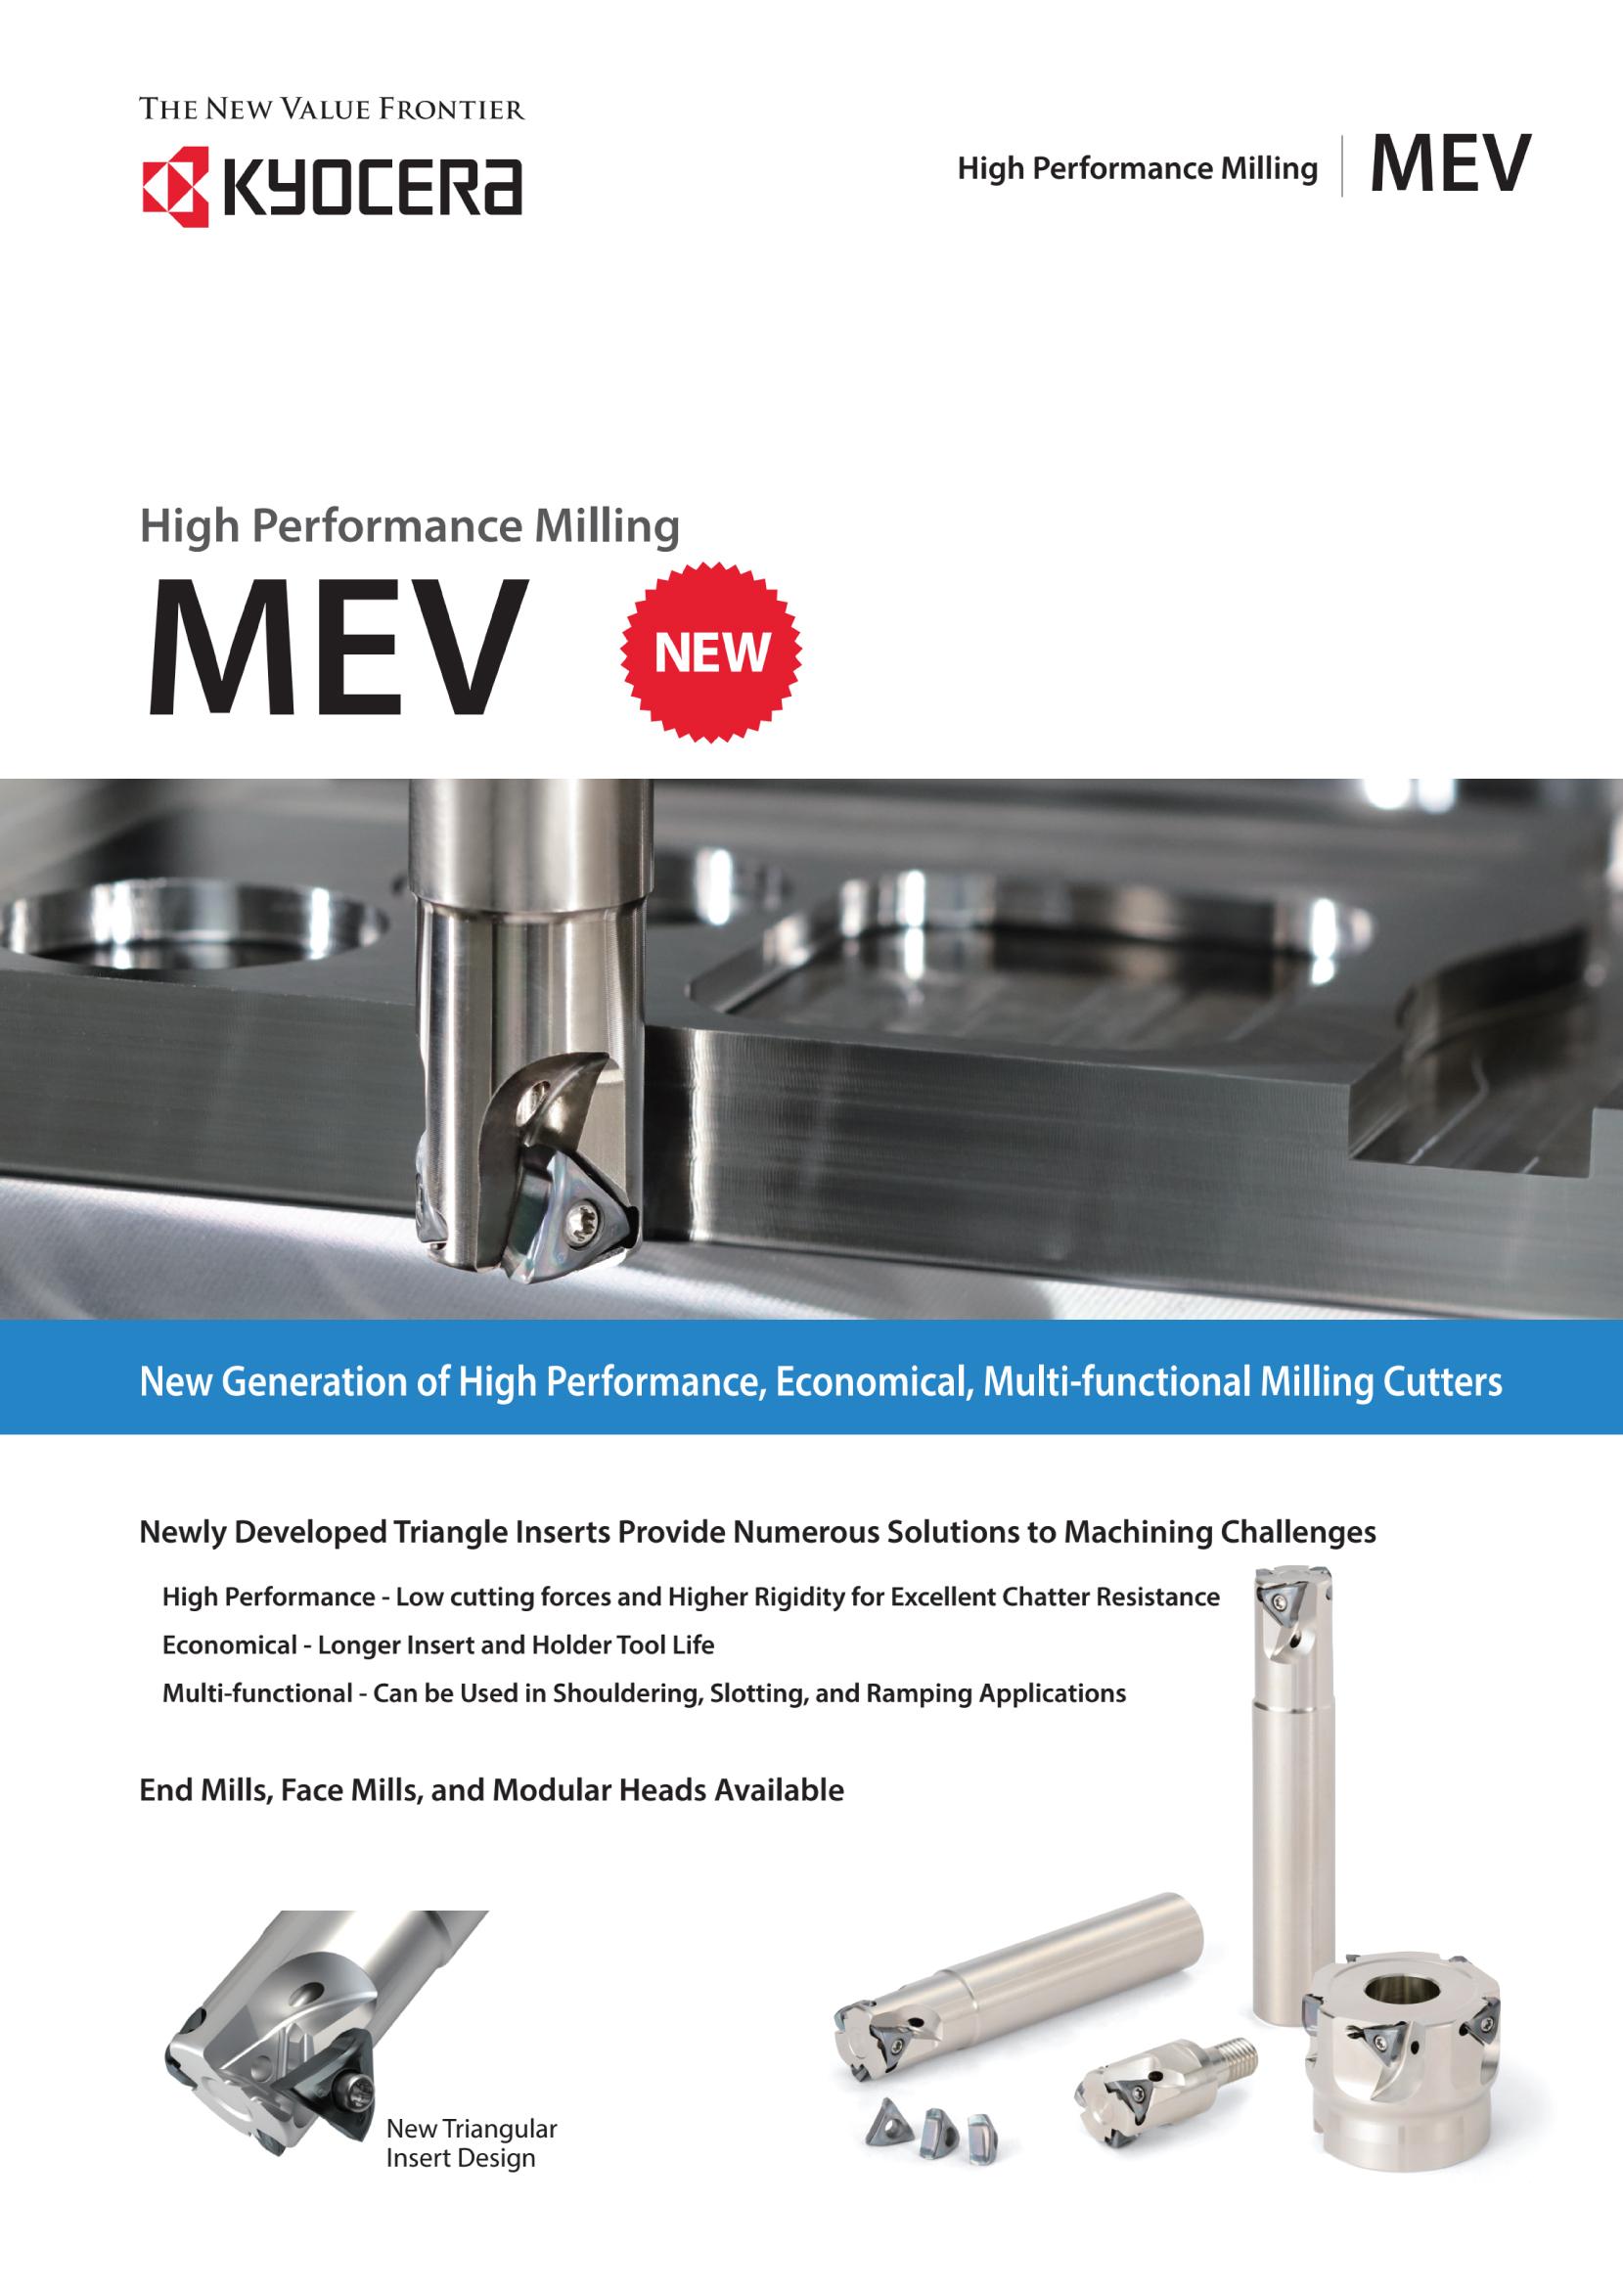 Dao phay gắn mảnh Kyocera MEV hiệu suất cao